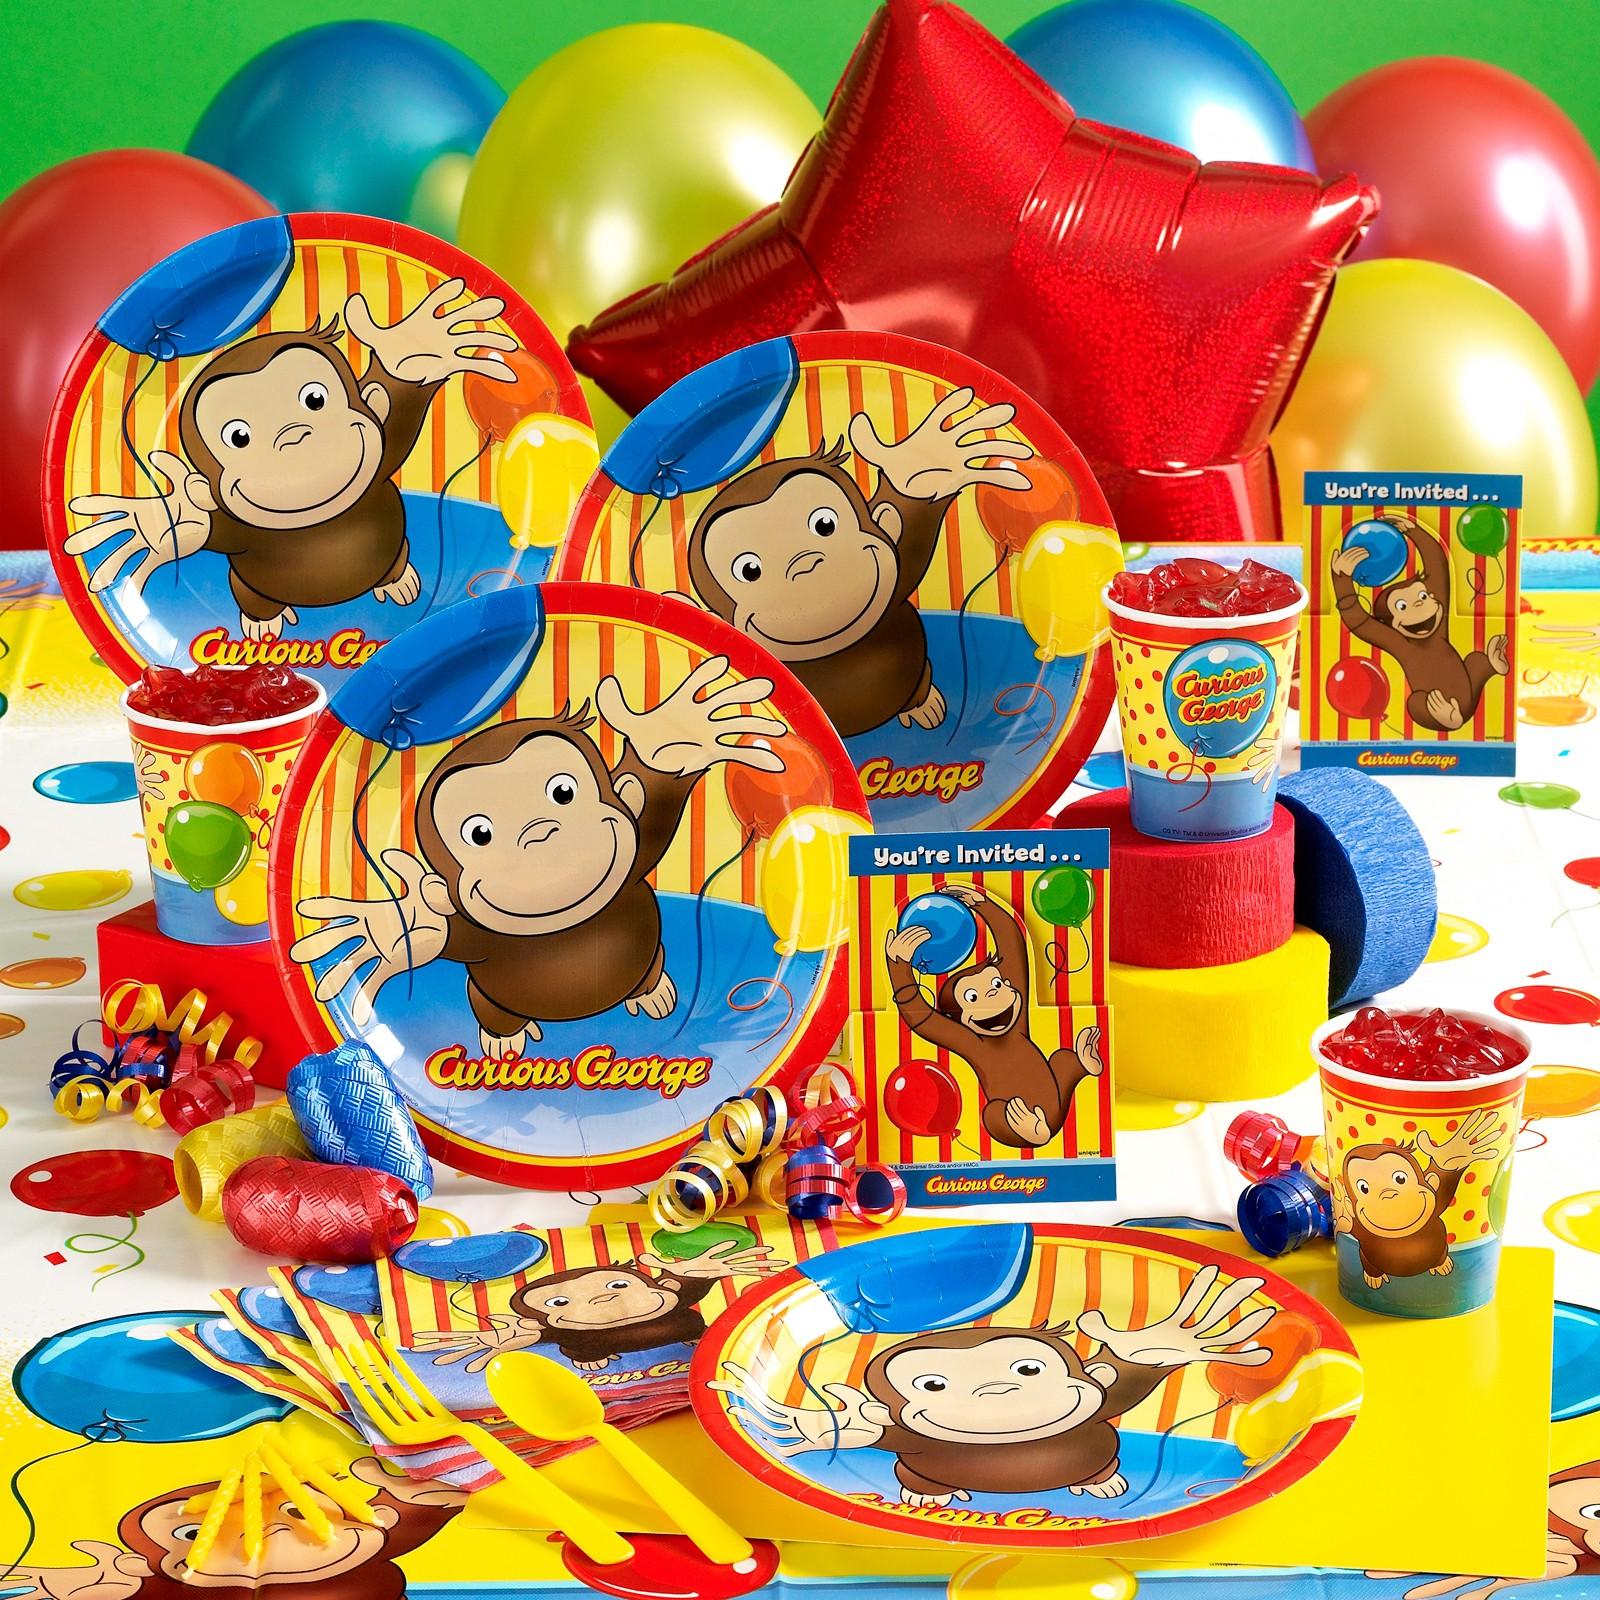 Curious George Birthday Party Theme Idea Mylesjerry